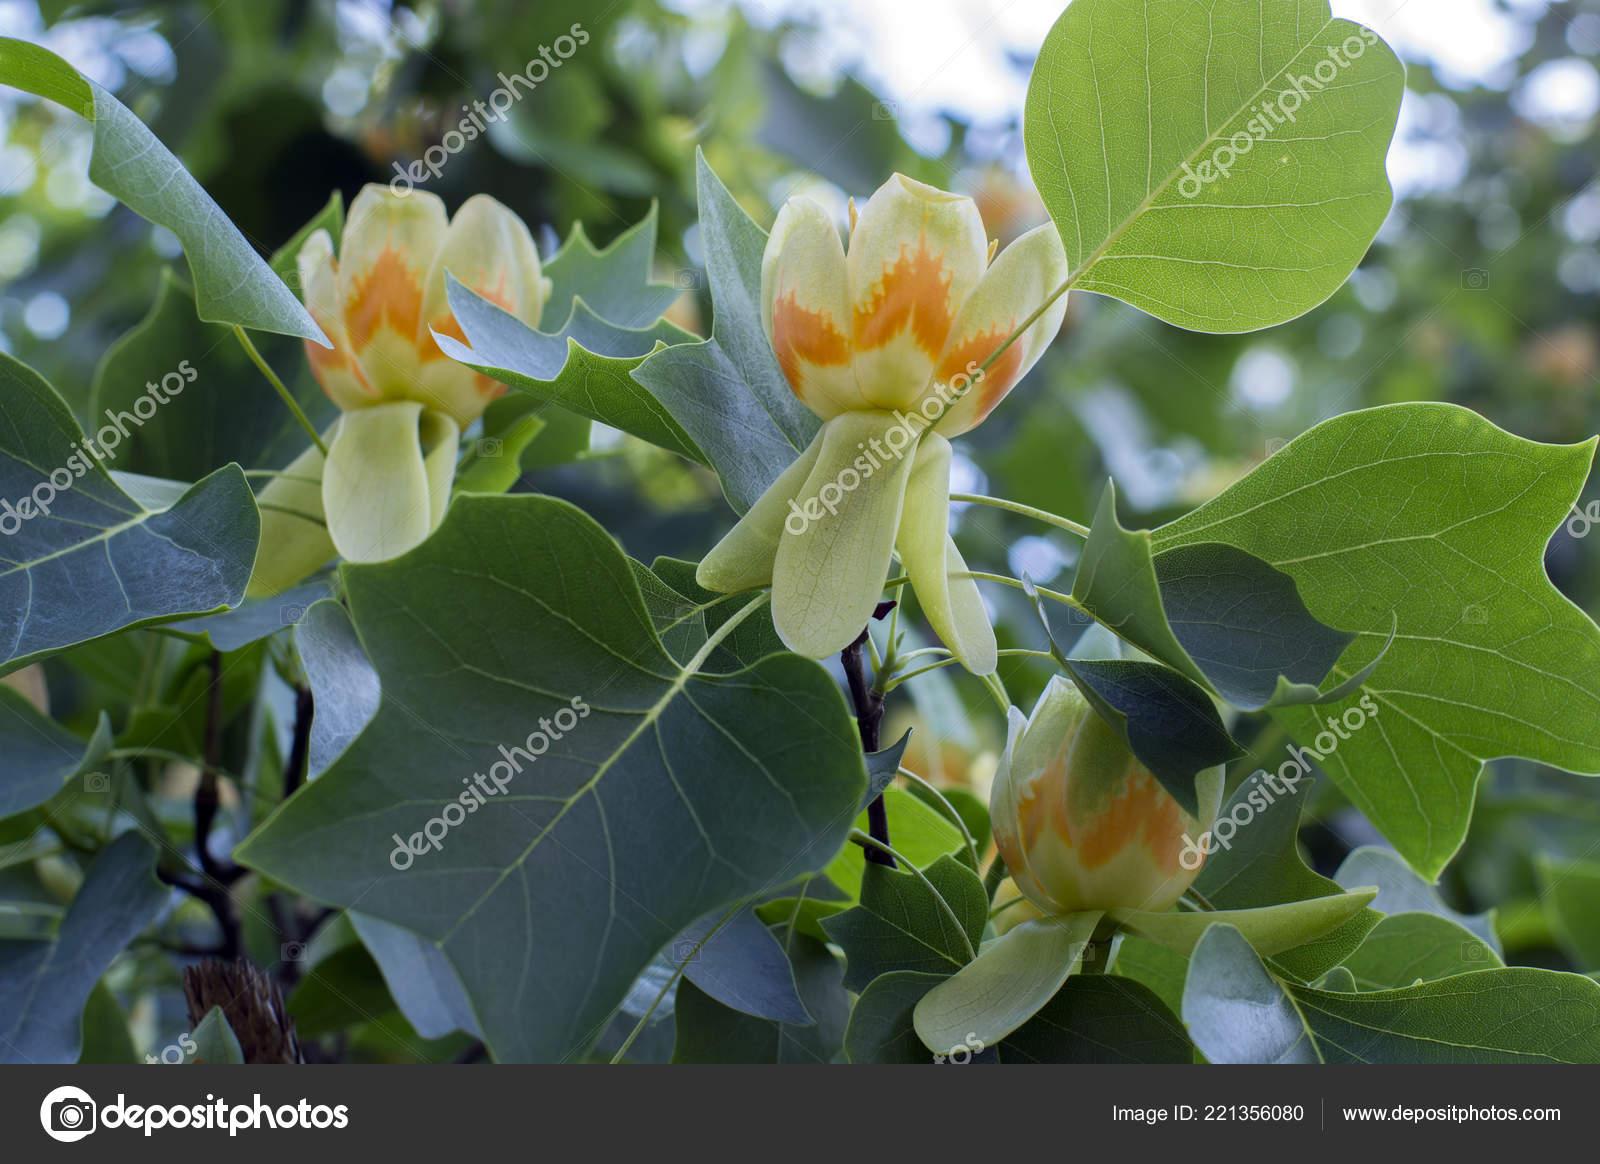 Liriodendron Tulipifera Beautiful Ornamental Tree Bloom Branches